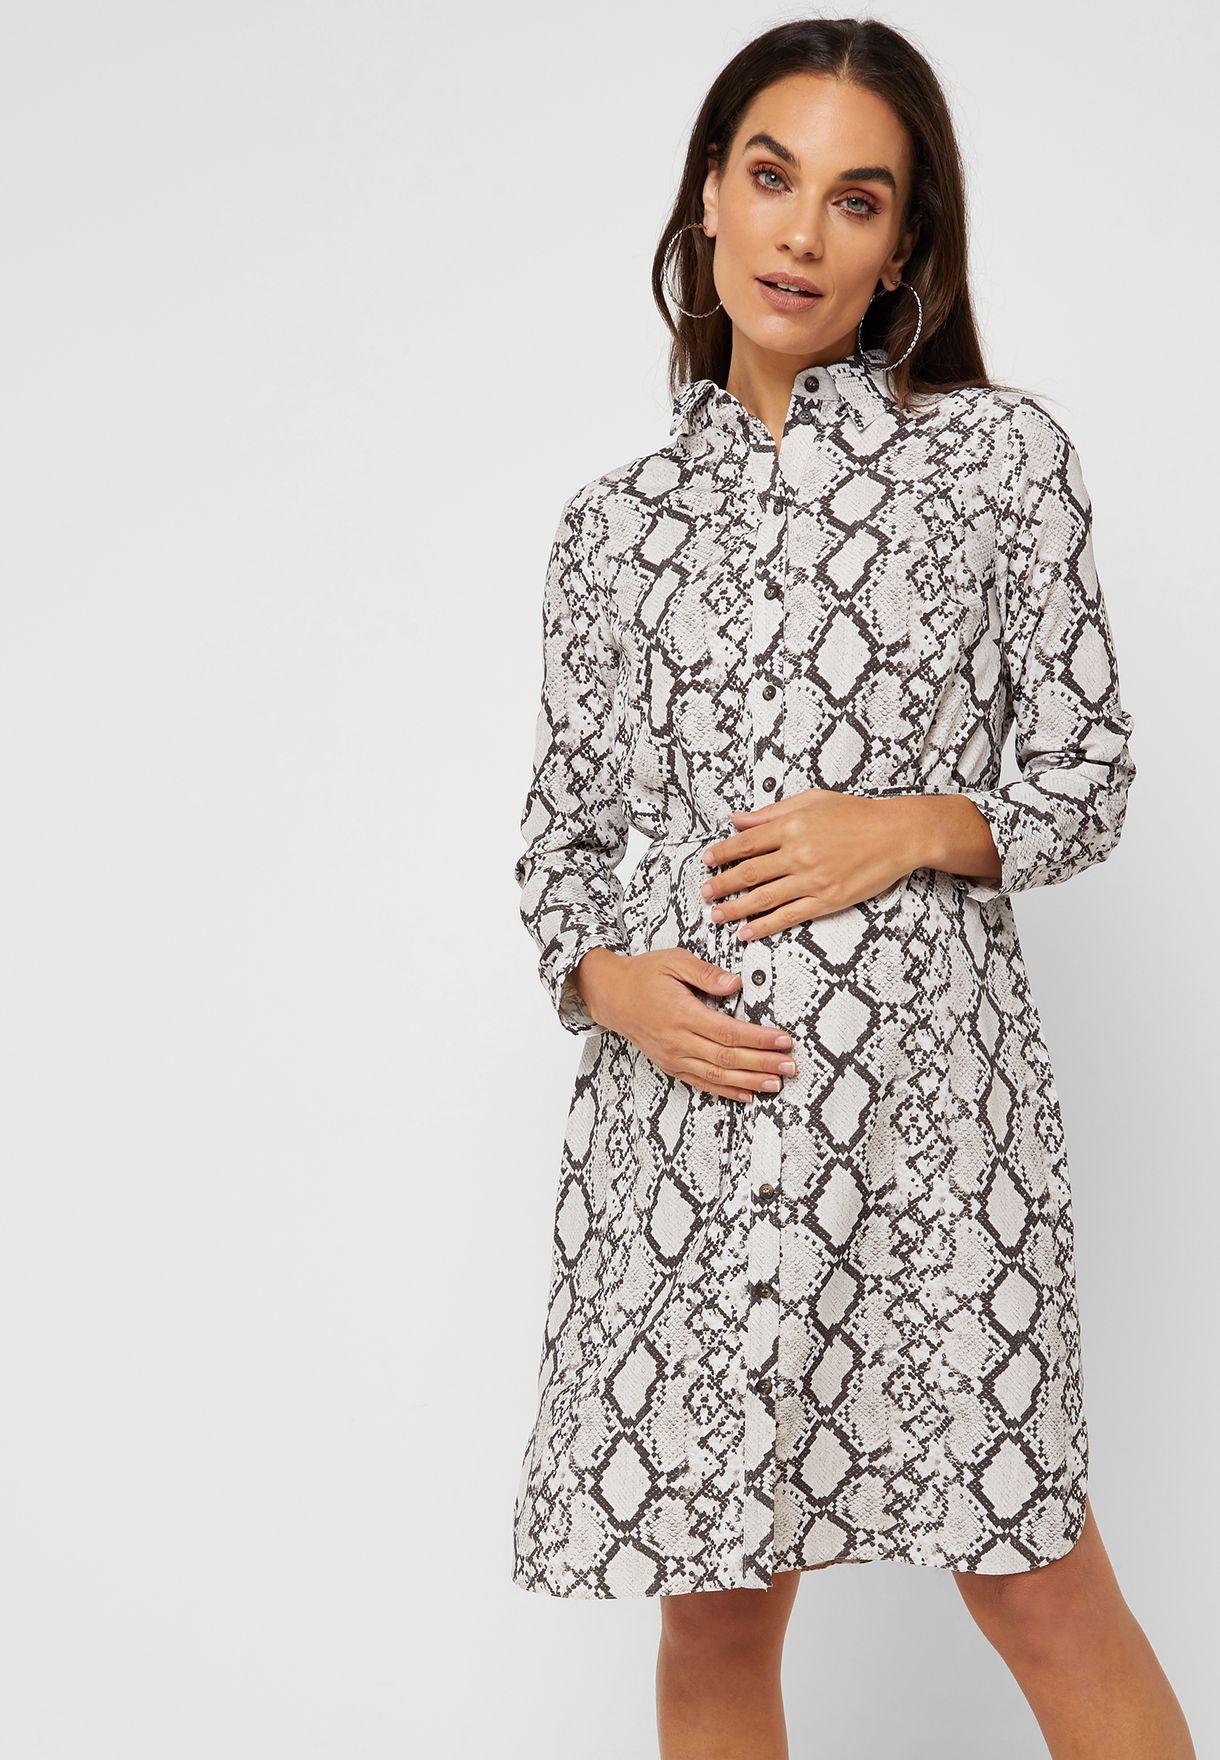 73bf38edbd Shop Dorothy Perkins Maternity prints Snake Print Shirt Dress ...